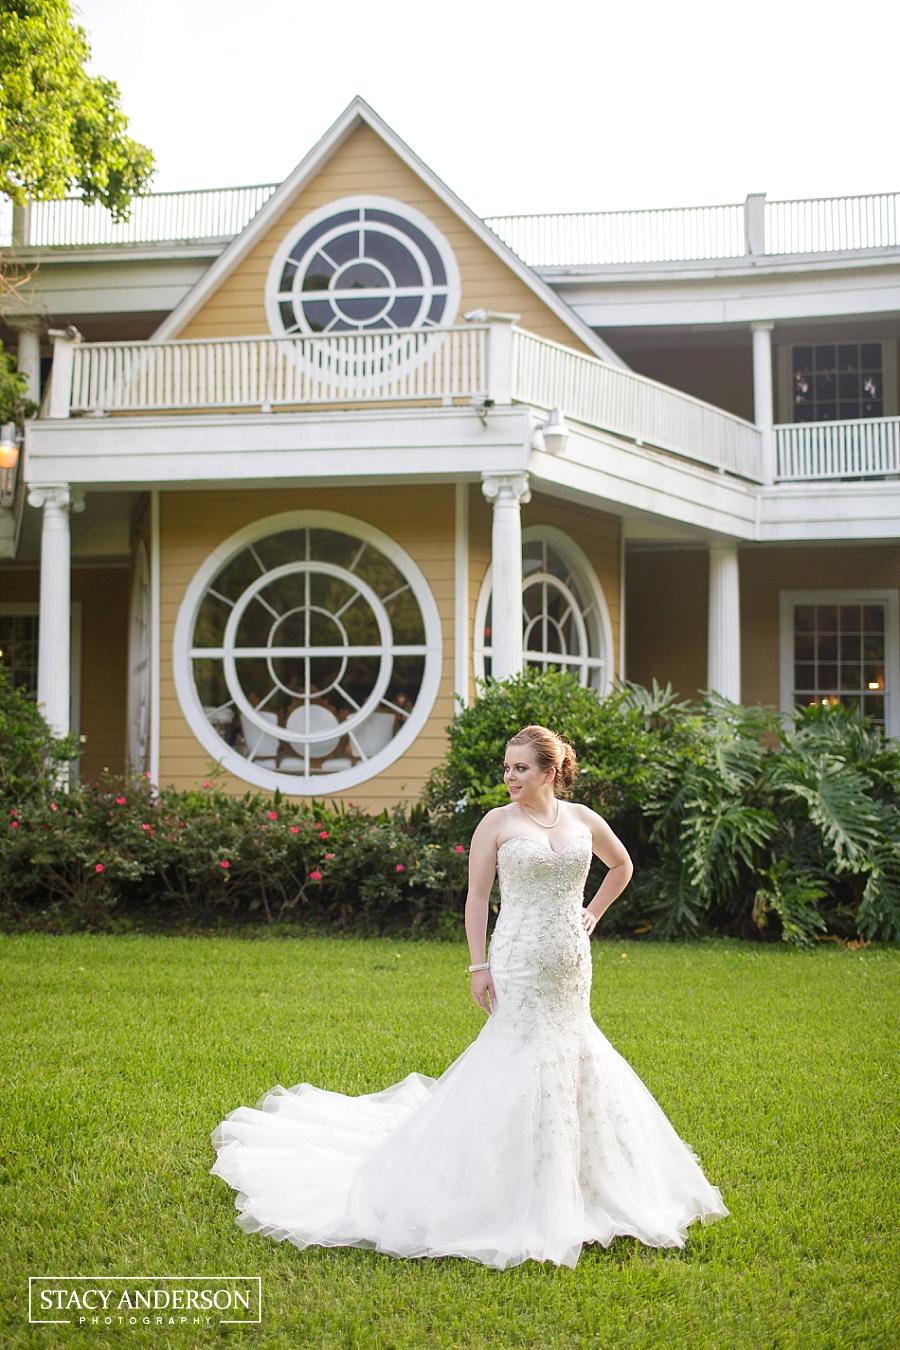 Stacy Anderson Photography Heaven on Earth Wedding Photographer_1703